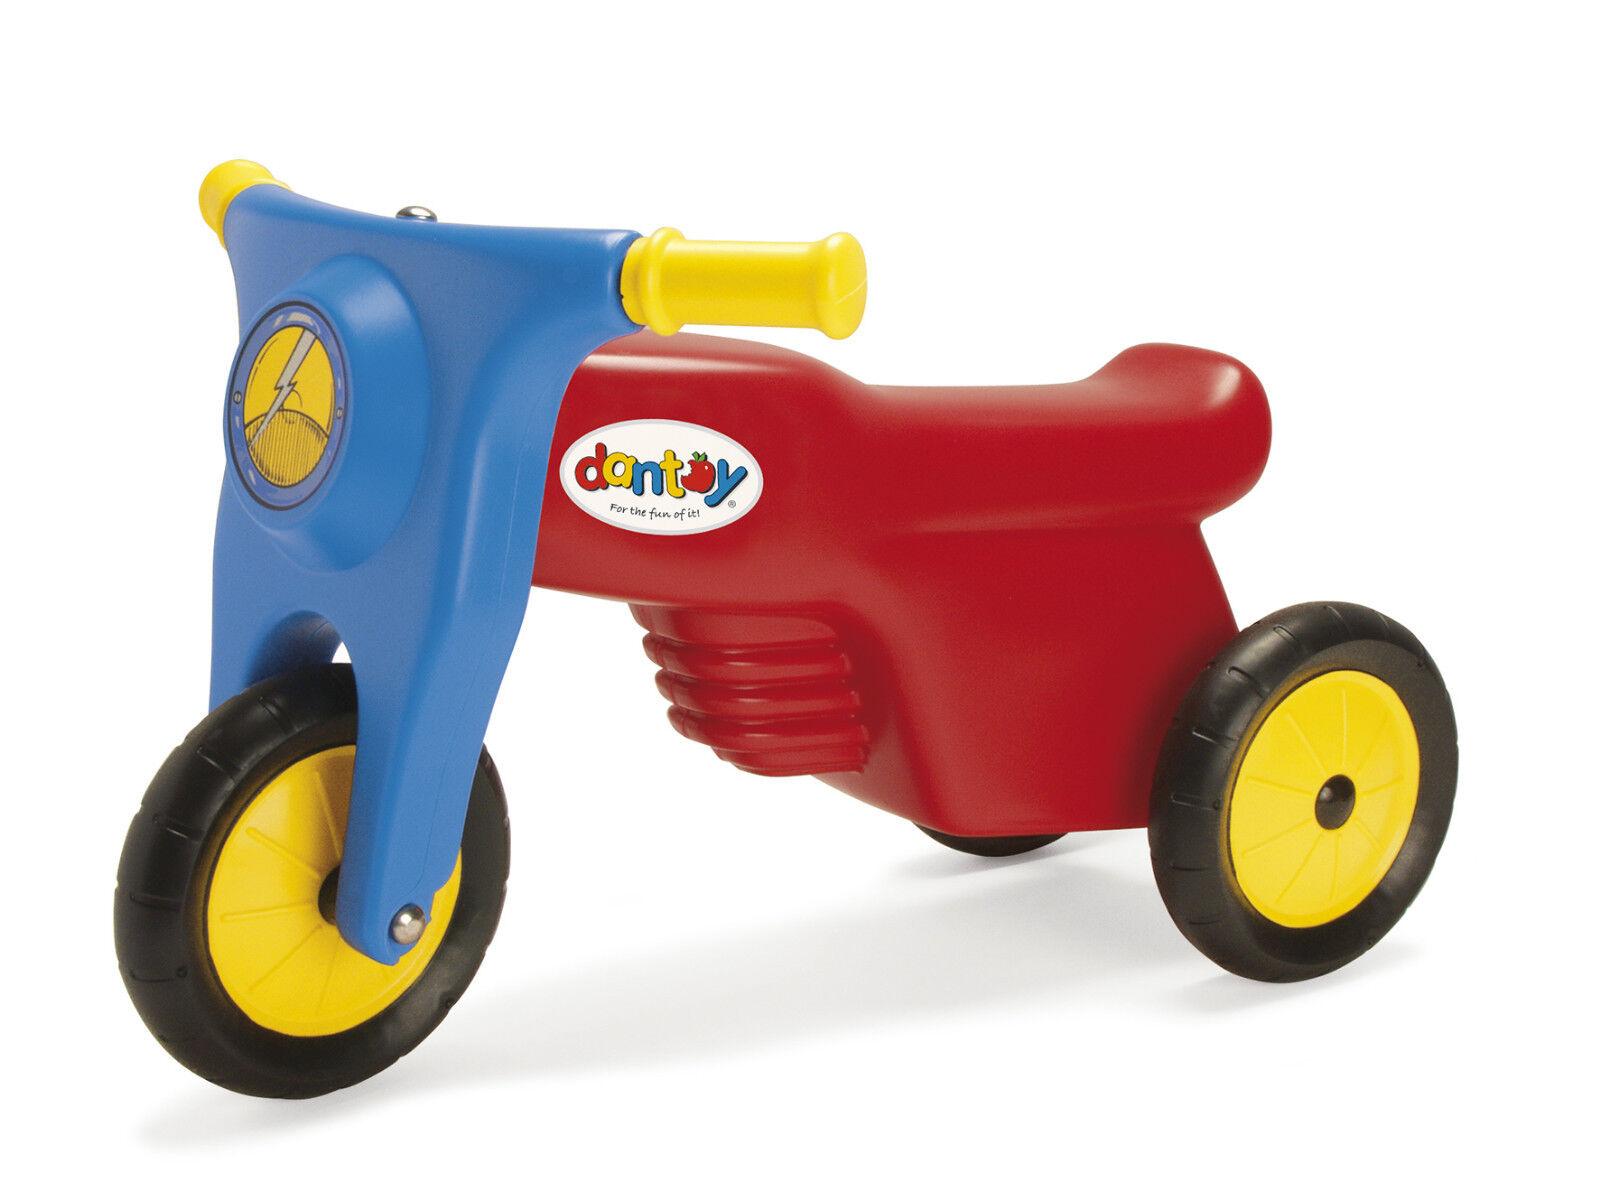 Robusto Dantoy Infantil Moto Motor Bici Ciclismo - Mini Racer con Goma Ruedas